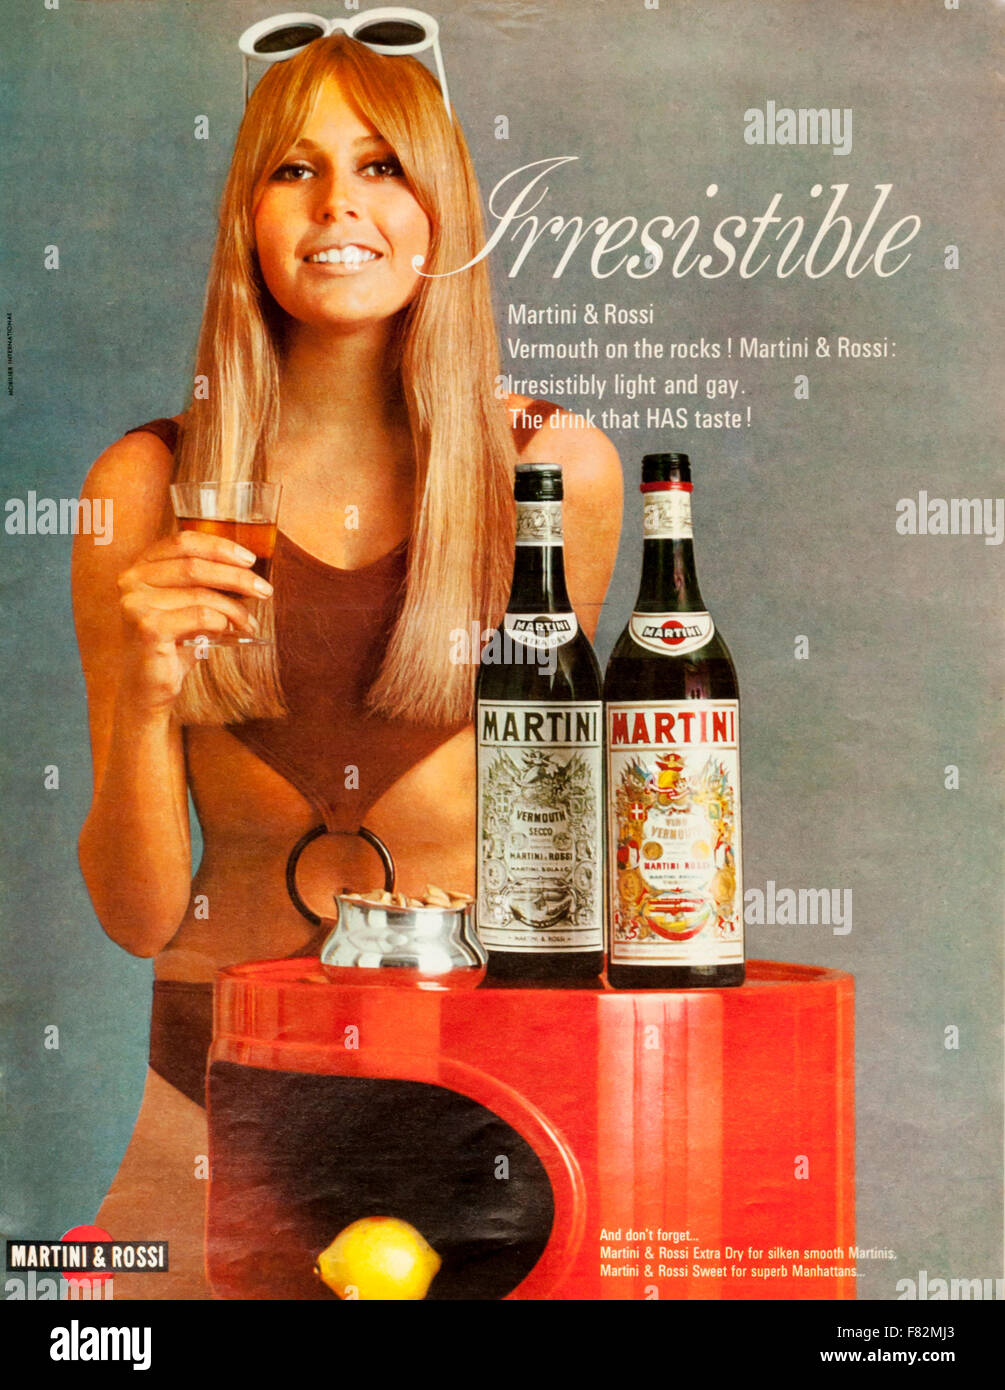 1960s Magazine Advertisement Advertising Martini & Rossi Vermouth ...